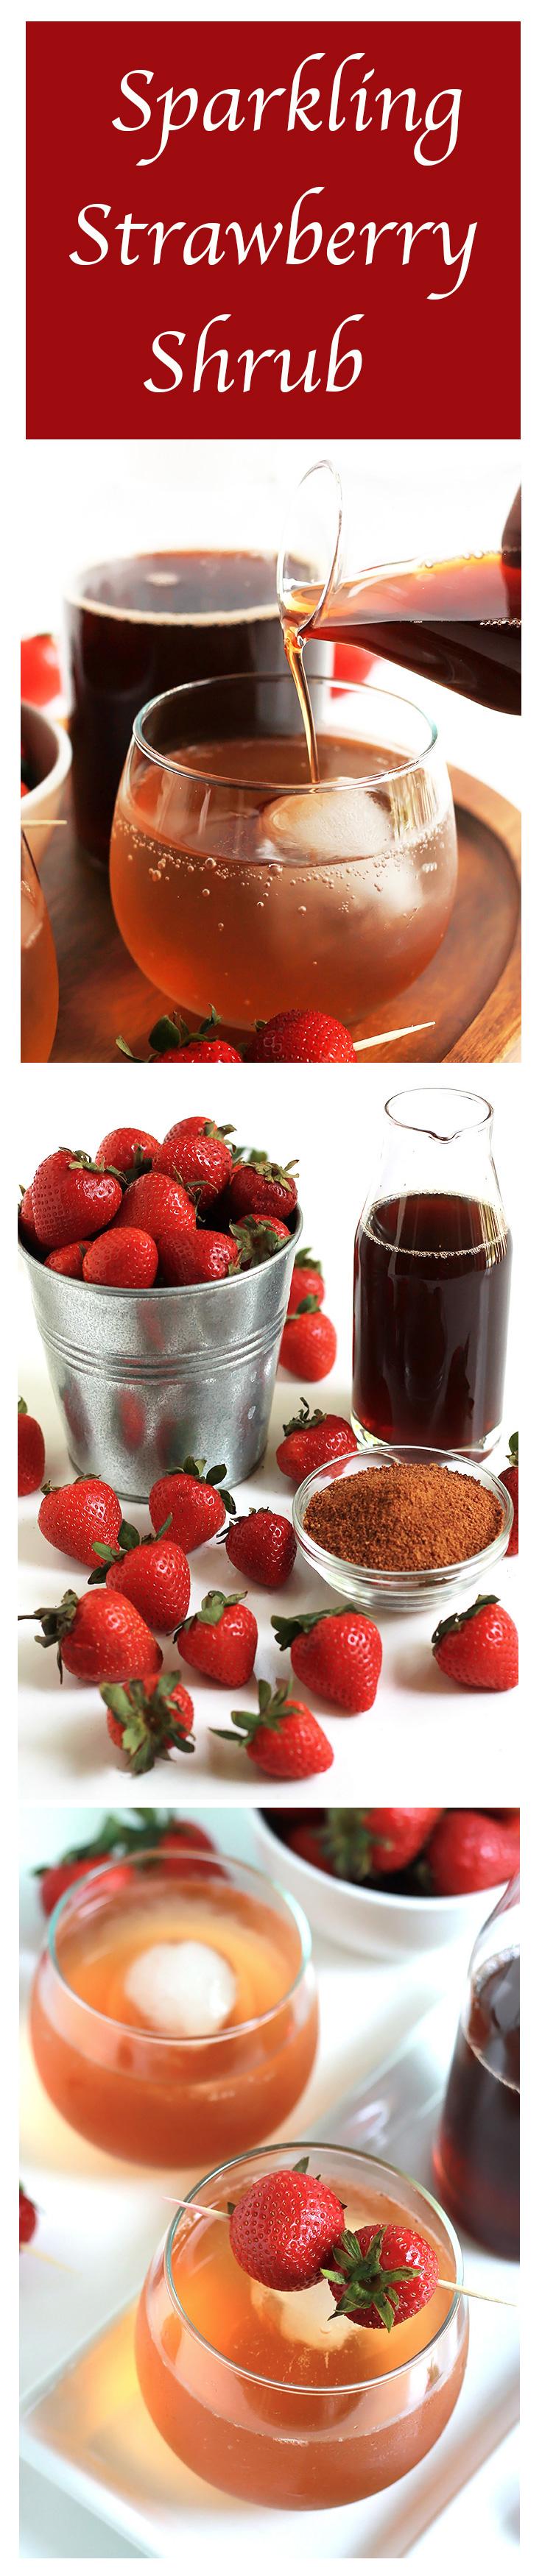 Sparkling-Strawberry-Shrub-Pin